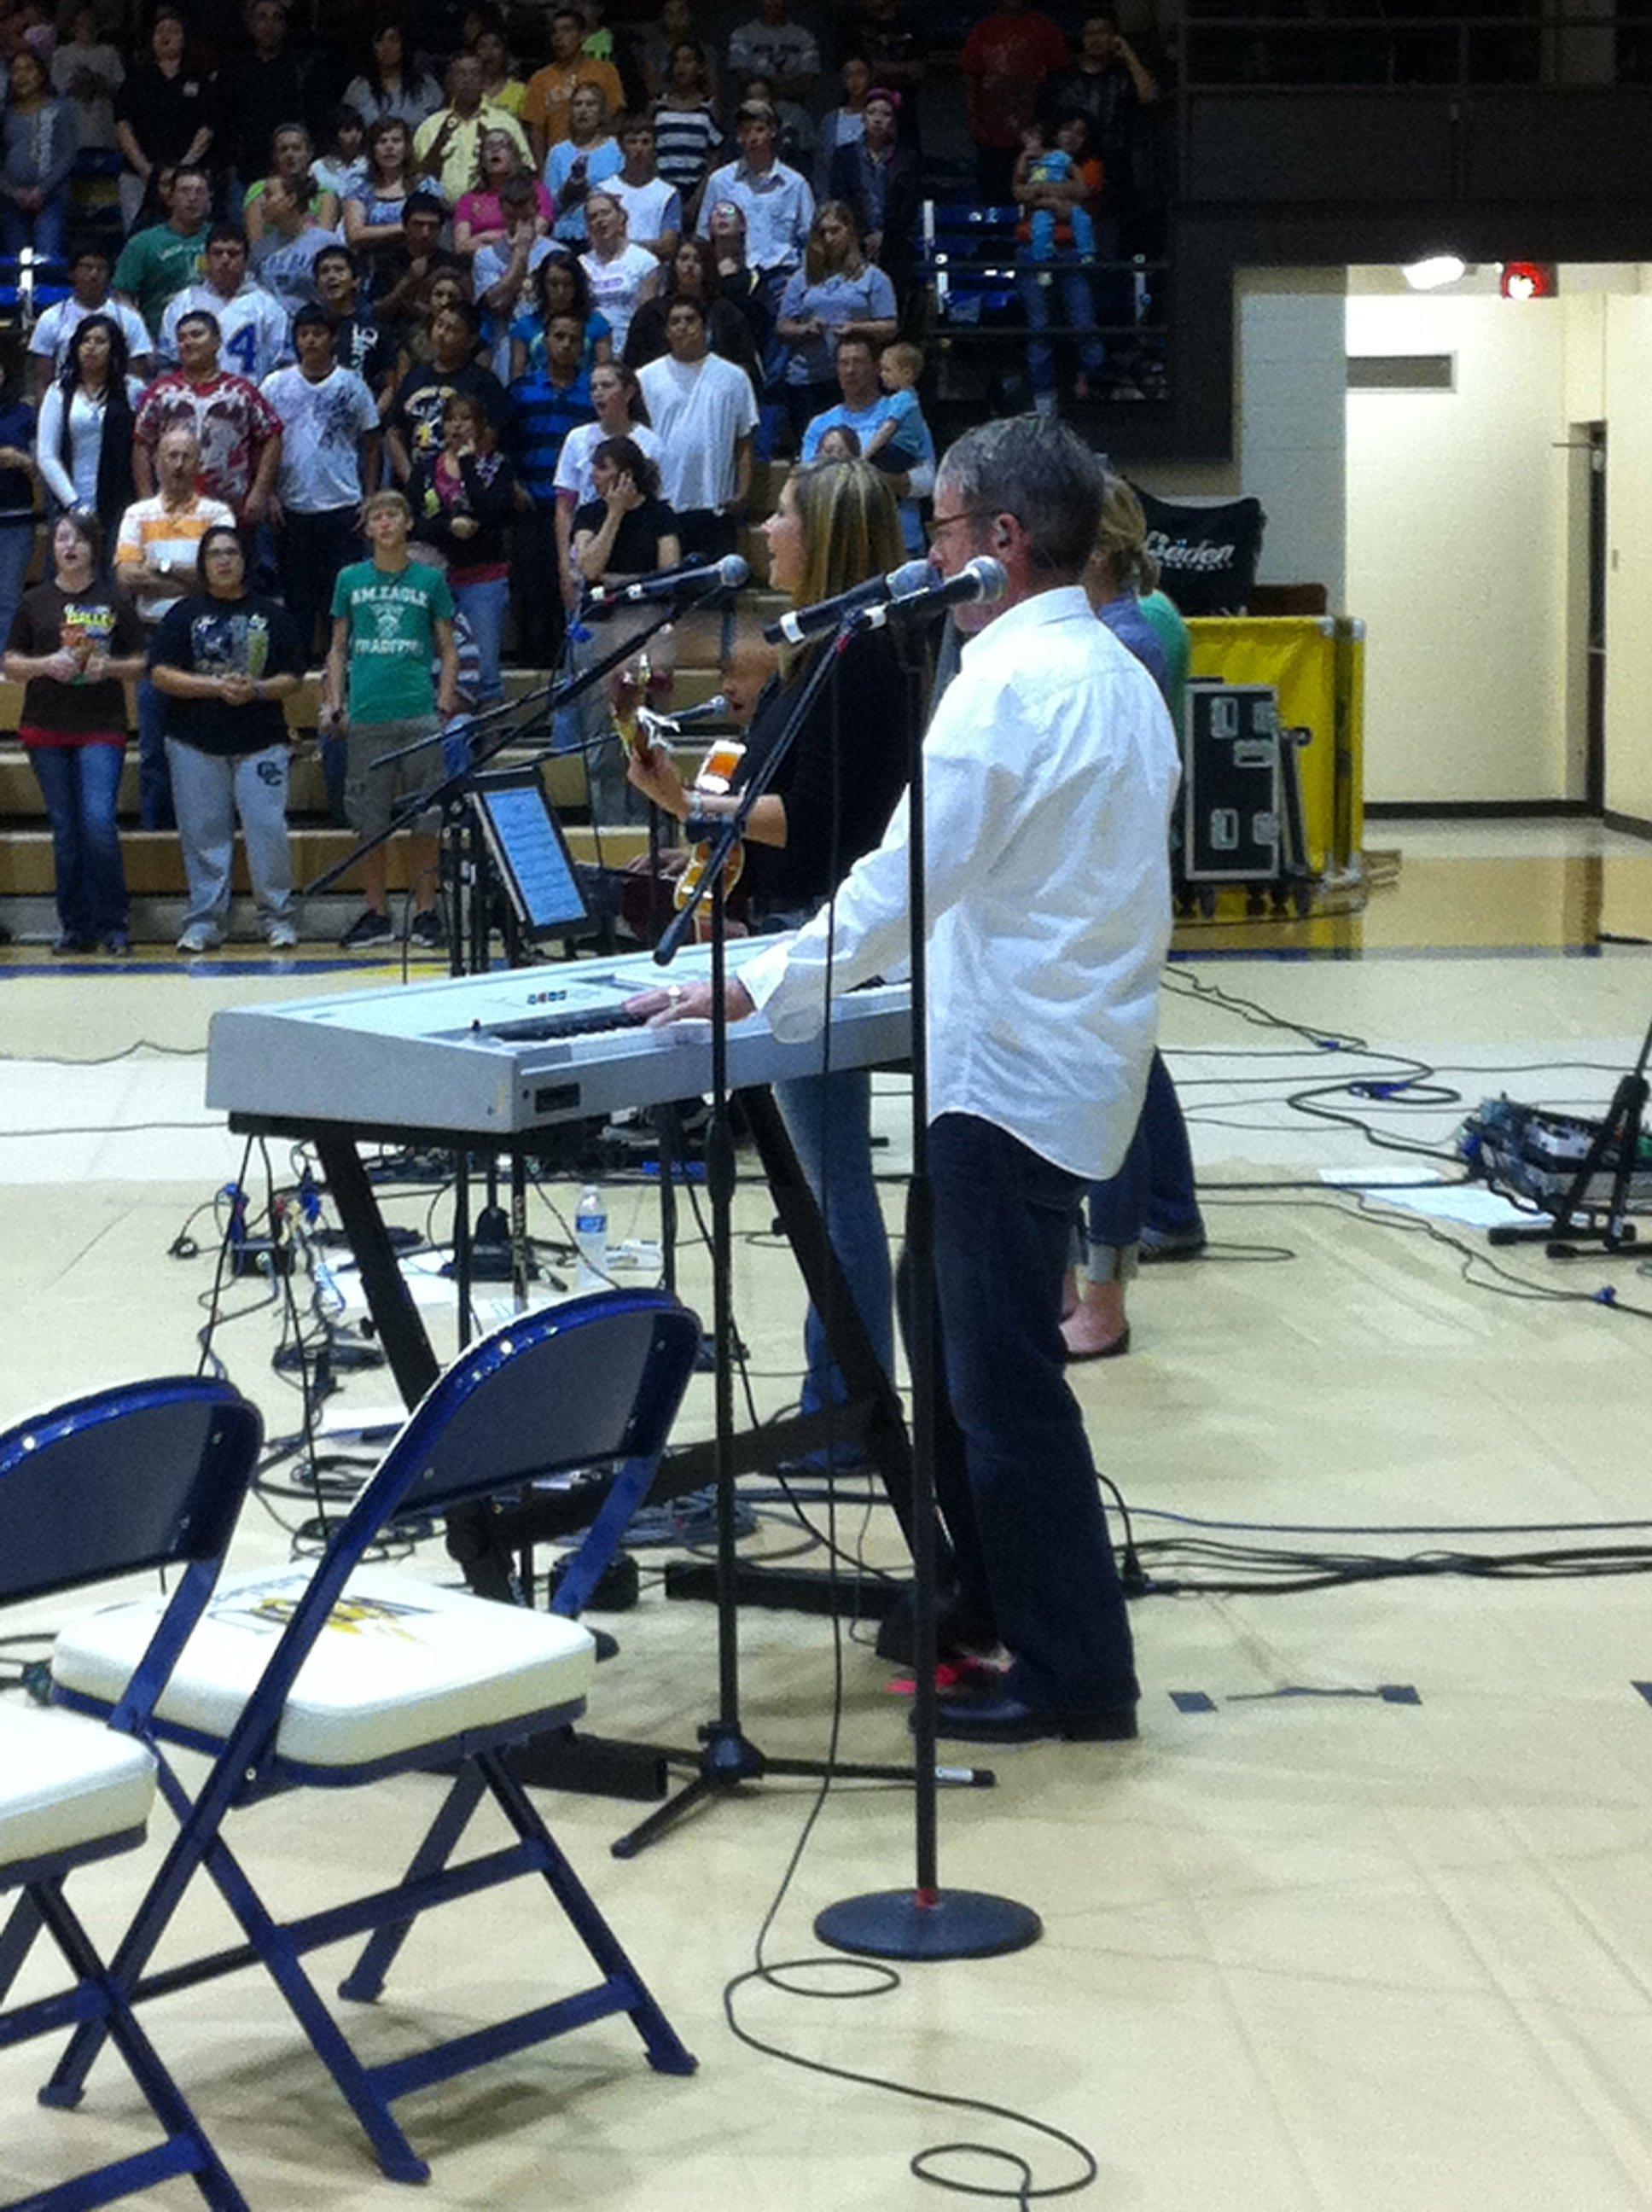 Chuck Sullivan singing, playing keys and leading worship